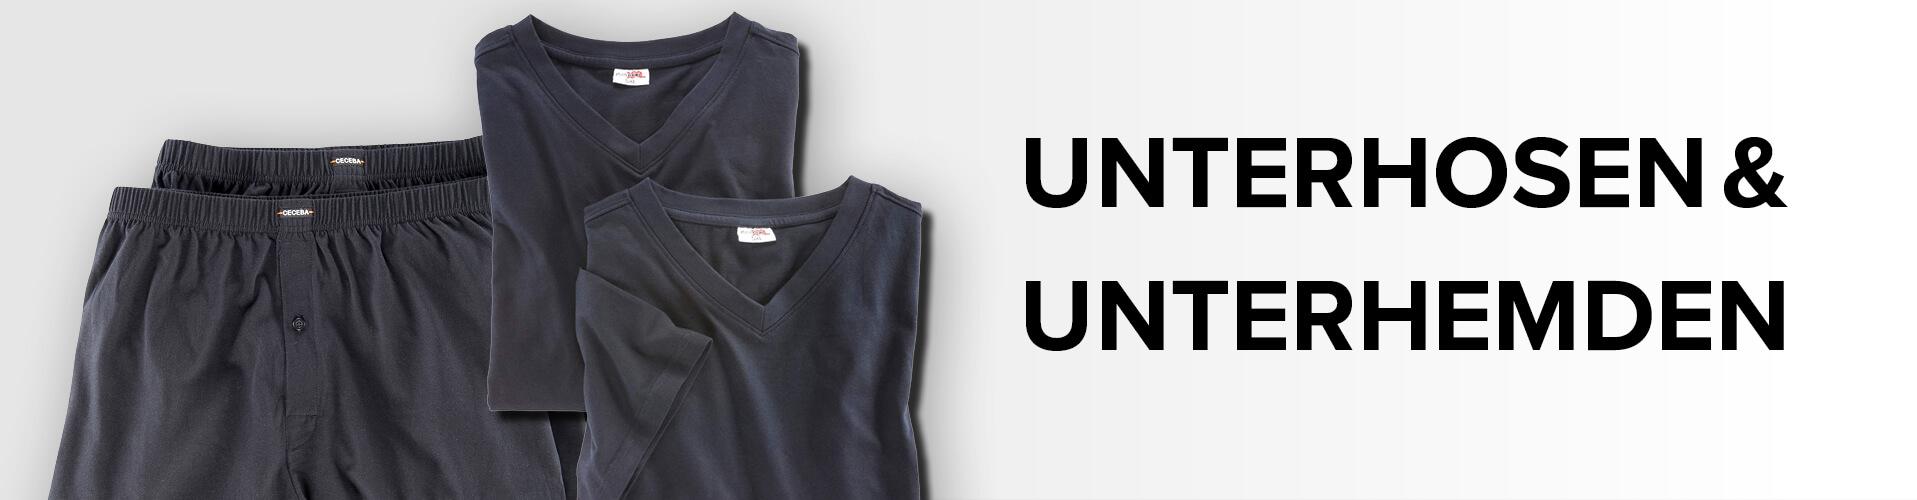 Unterhosen & Unterhemden Schmuckbild